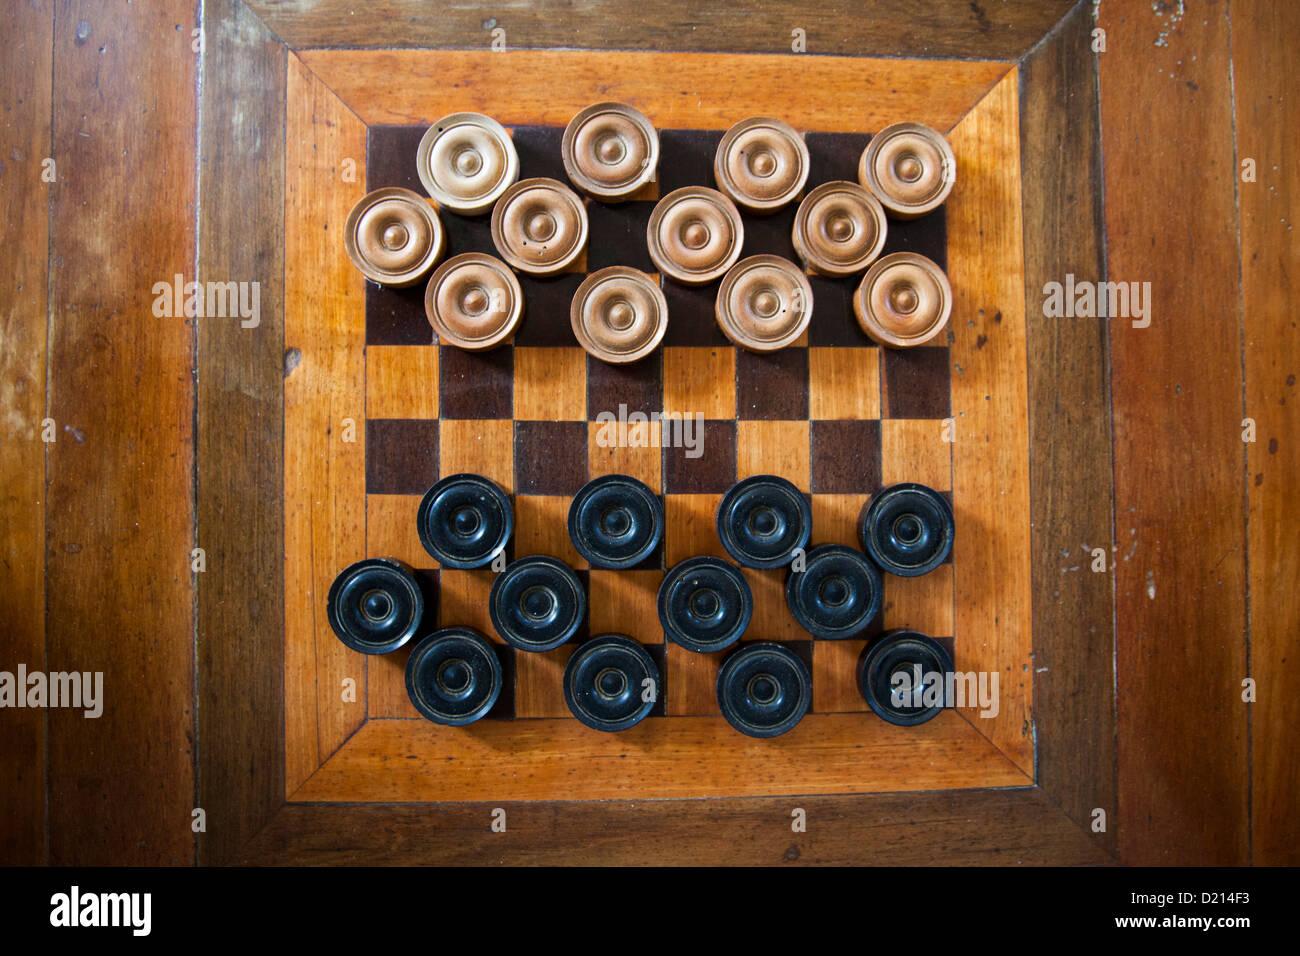 Schachbrett im Greenwood Greathouse, in der Nähe von Falmouth, St. James, Jamaika, Karibik Stockbild